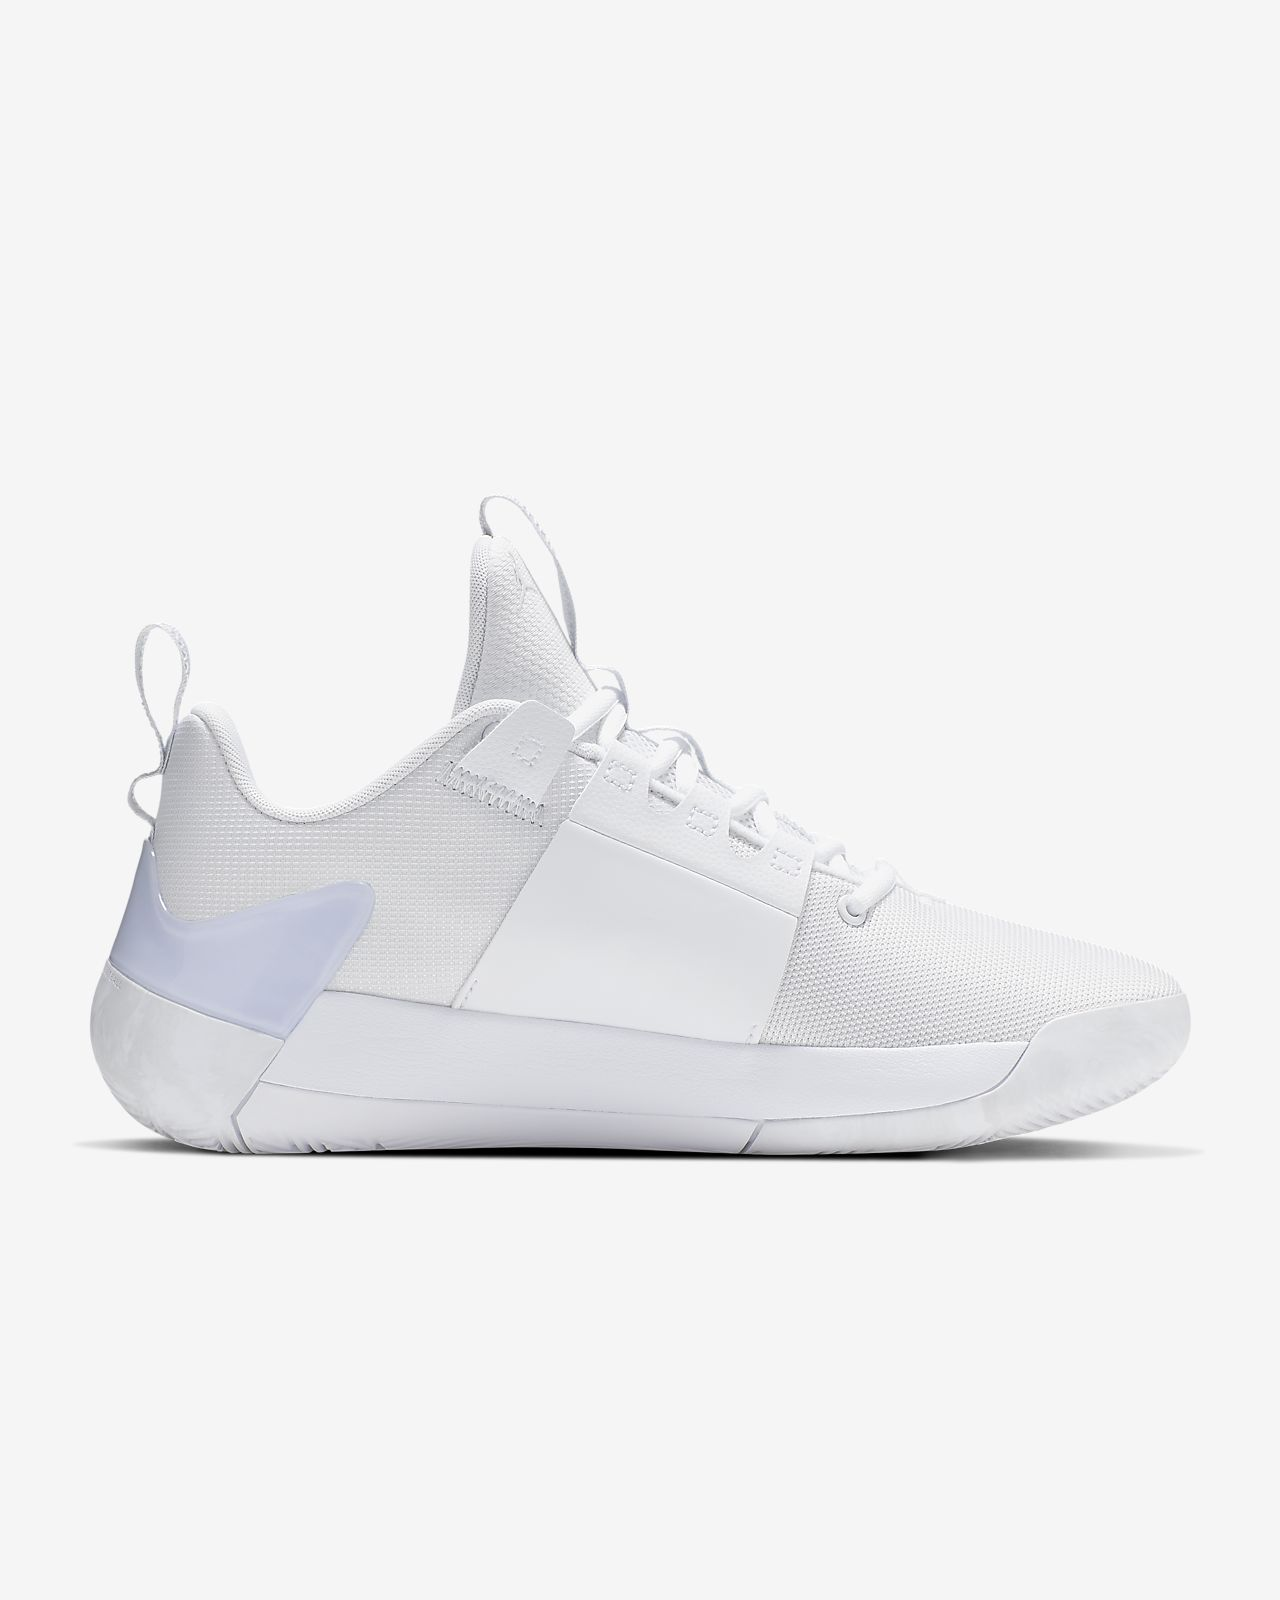 2c6c05efe089 Jordan Zoom Zero Gravity kosárlabdacipő. Nike.com HU